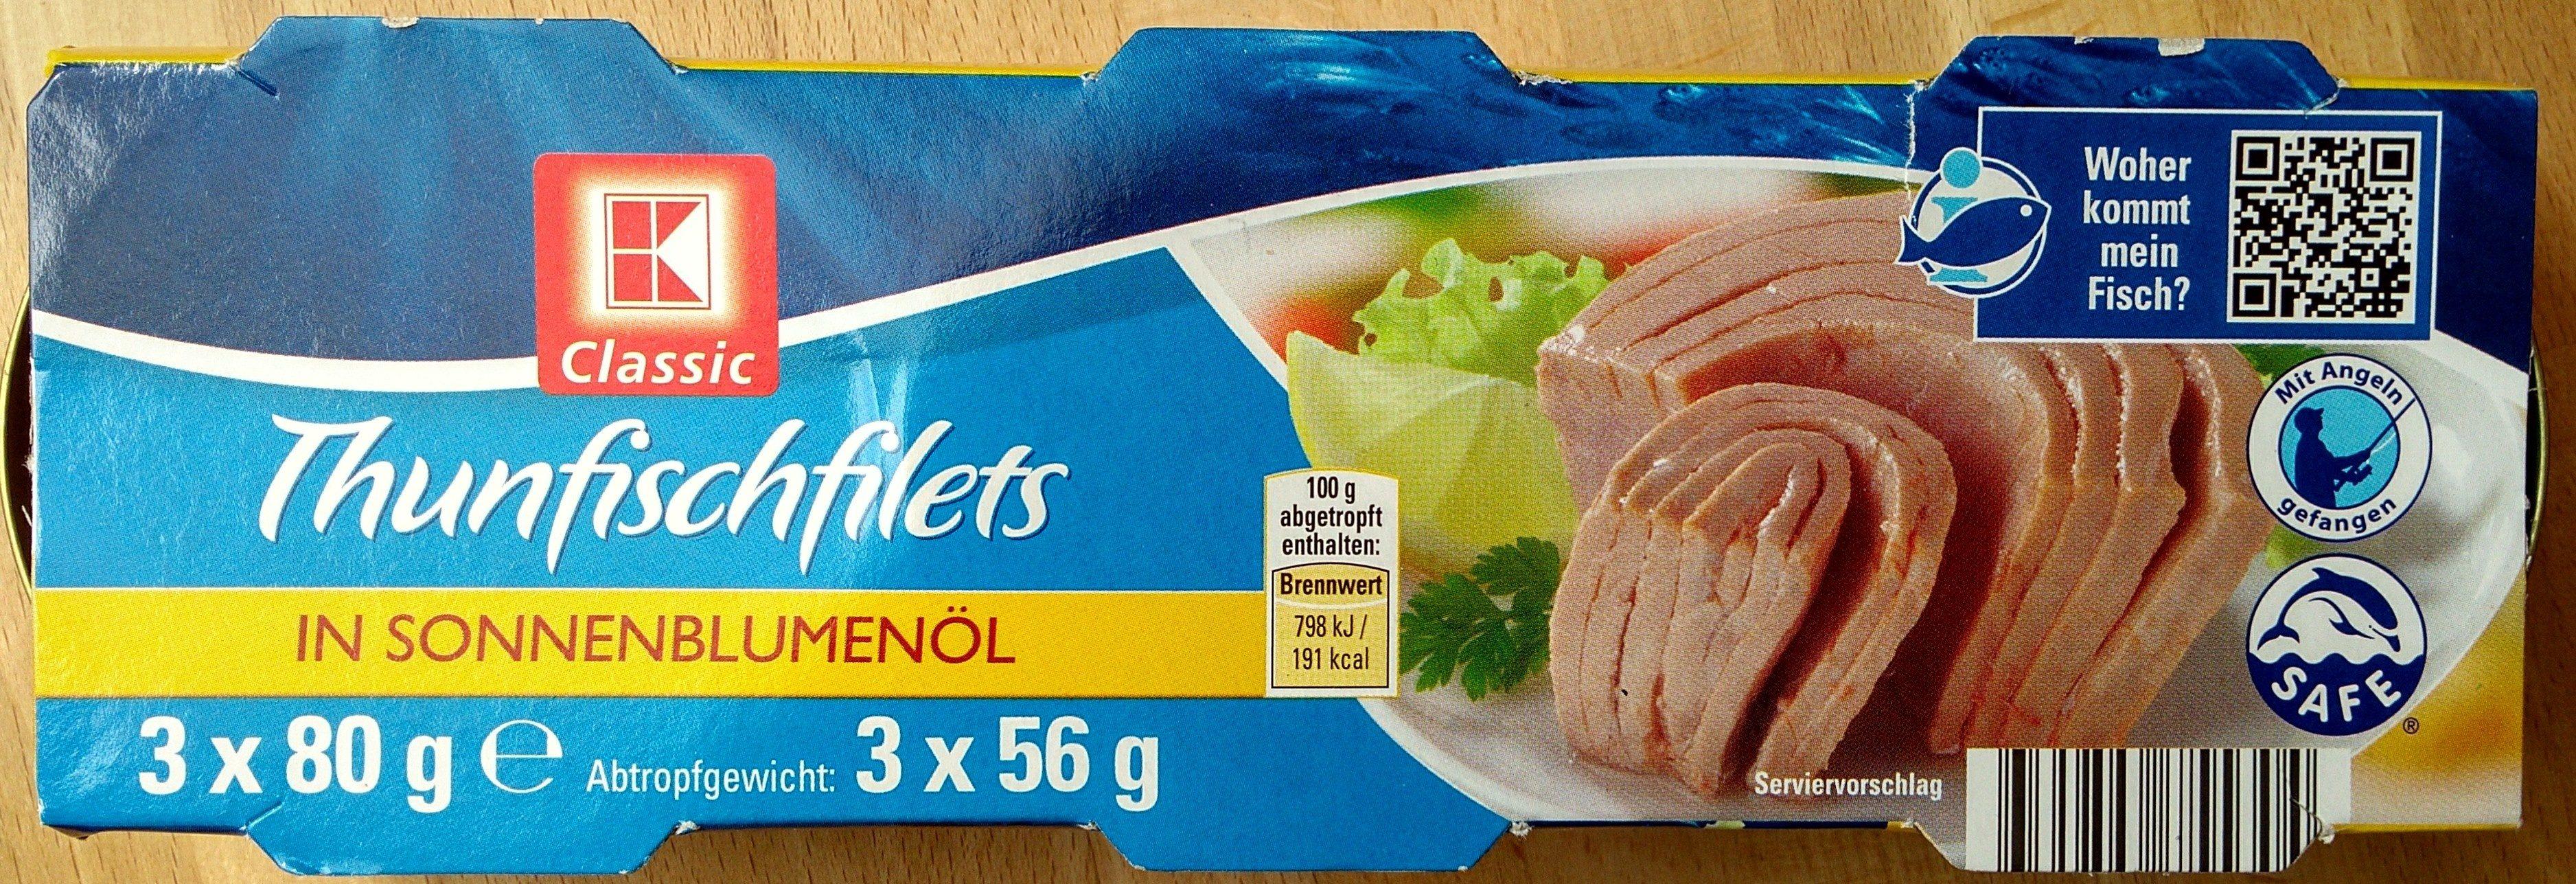 Thunfischfilets in Sonnenblumenöl - Product